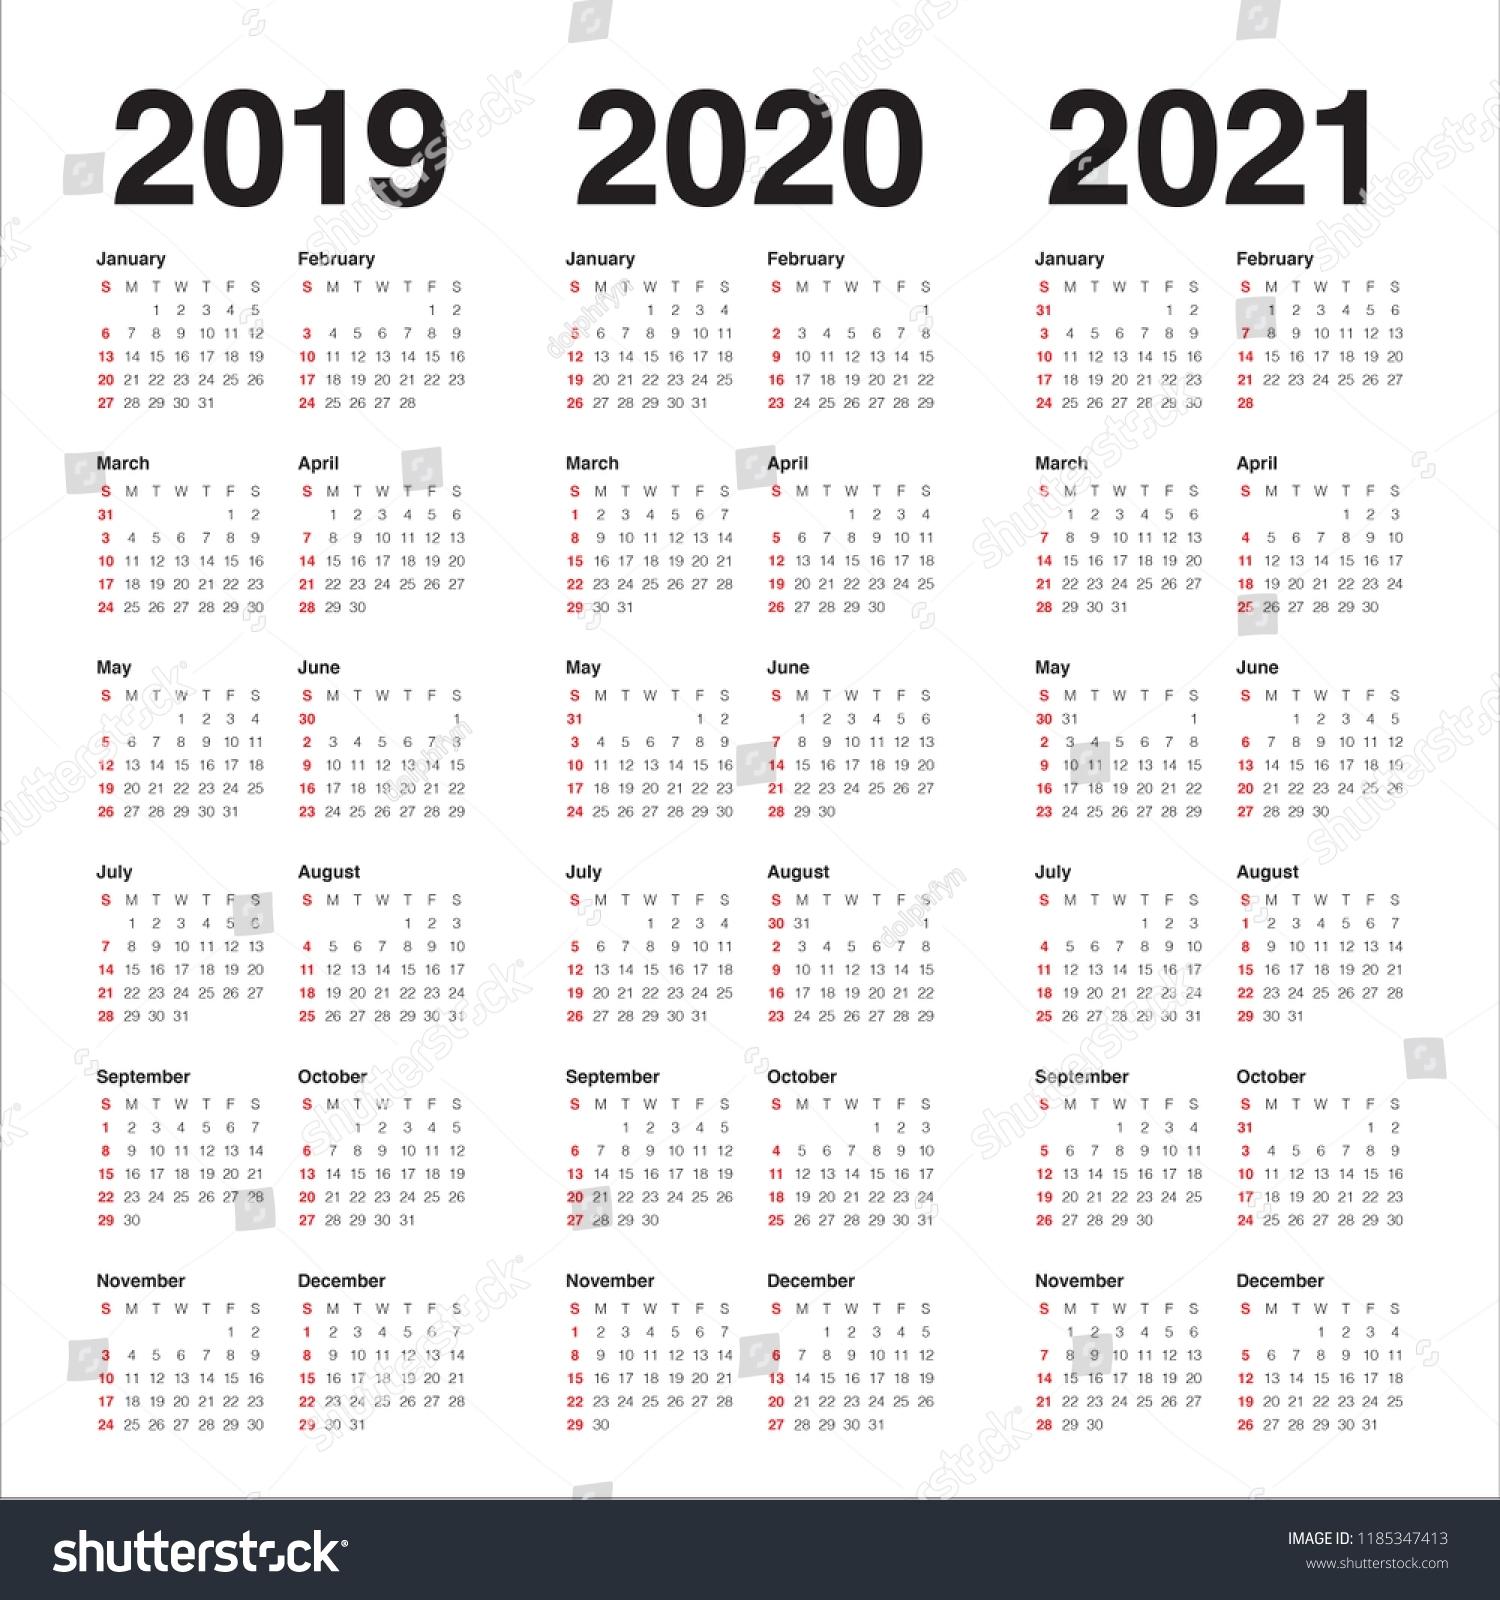 Year 2019 2020 2021 Calendar Vector Stock Vector (Royalty pertaining to 3 Year Calendar Printable 2019 2020 2021